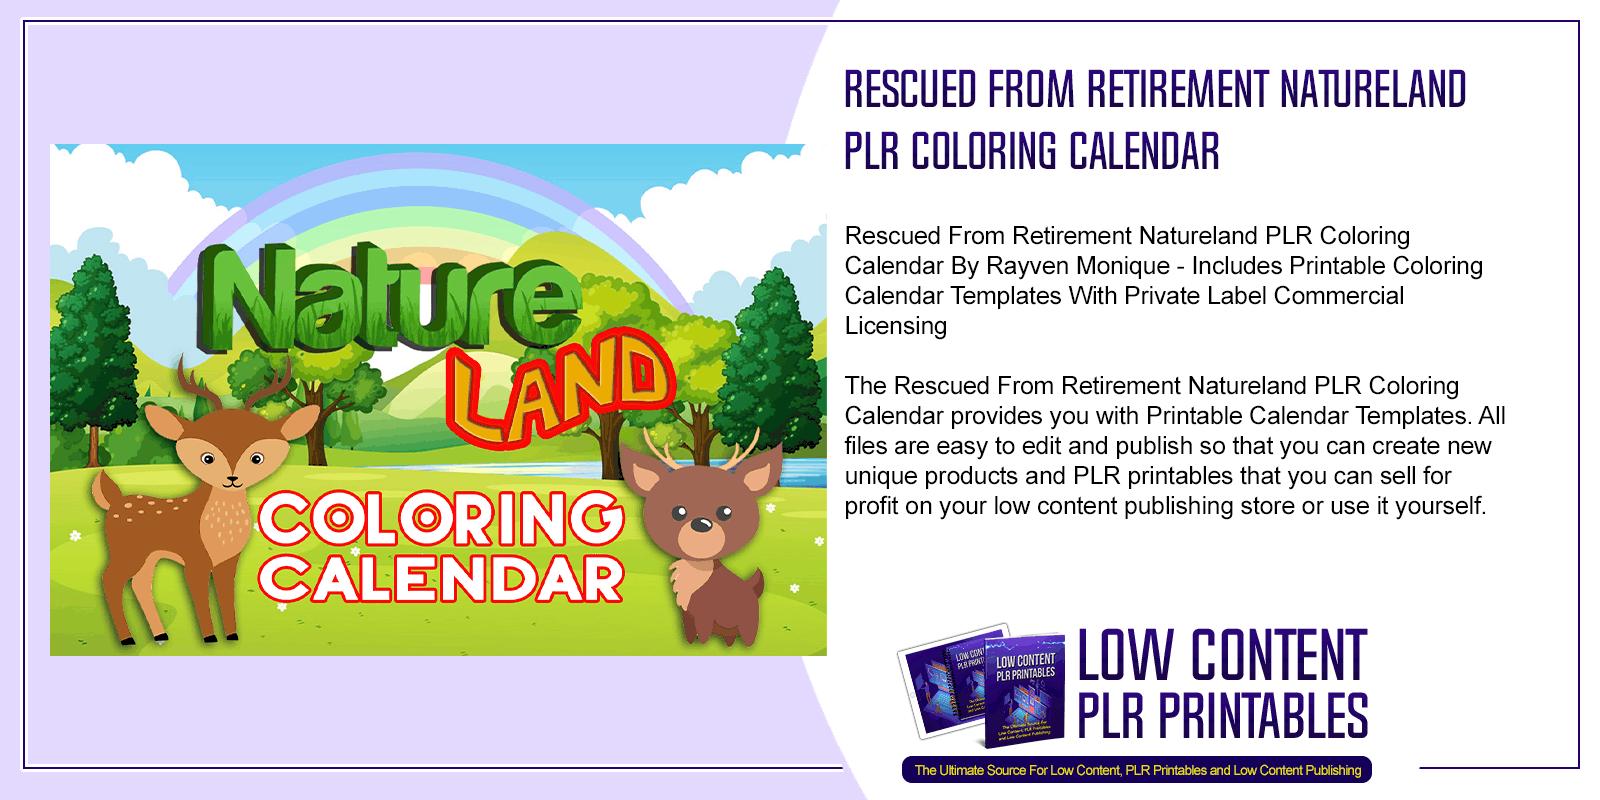 Rescued From Retirement Natureland PLR Coloring Calendar